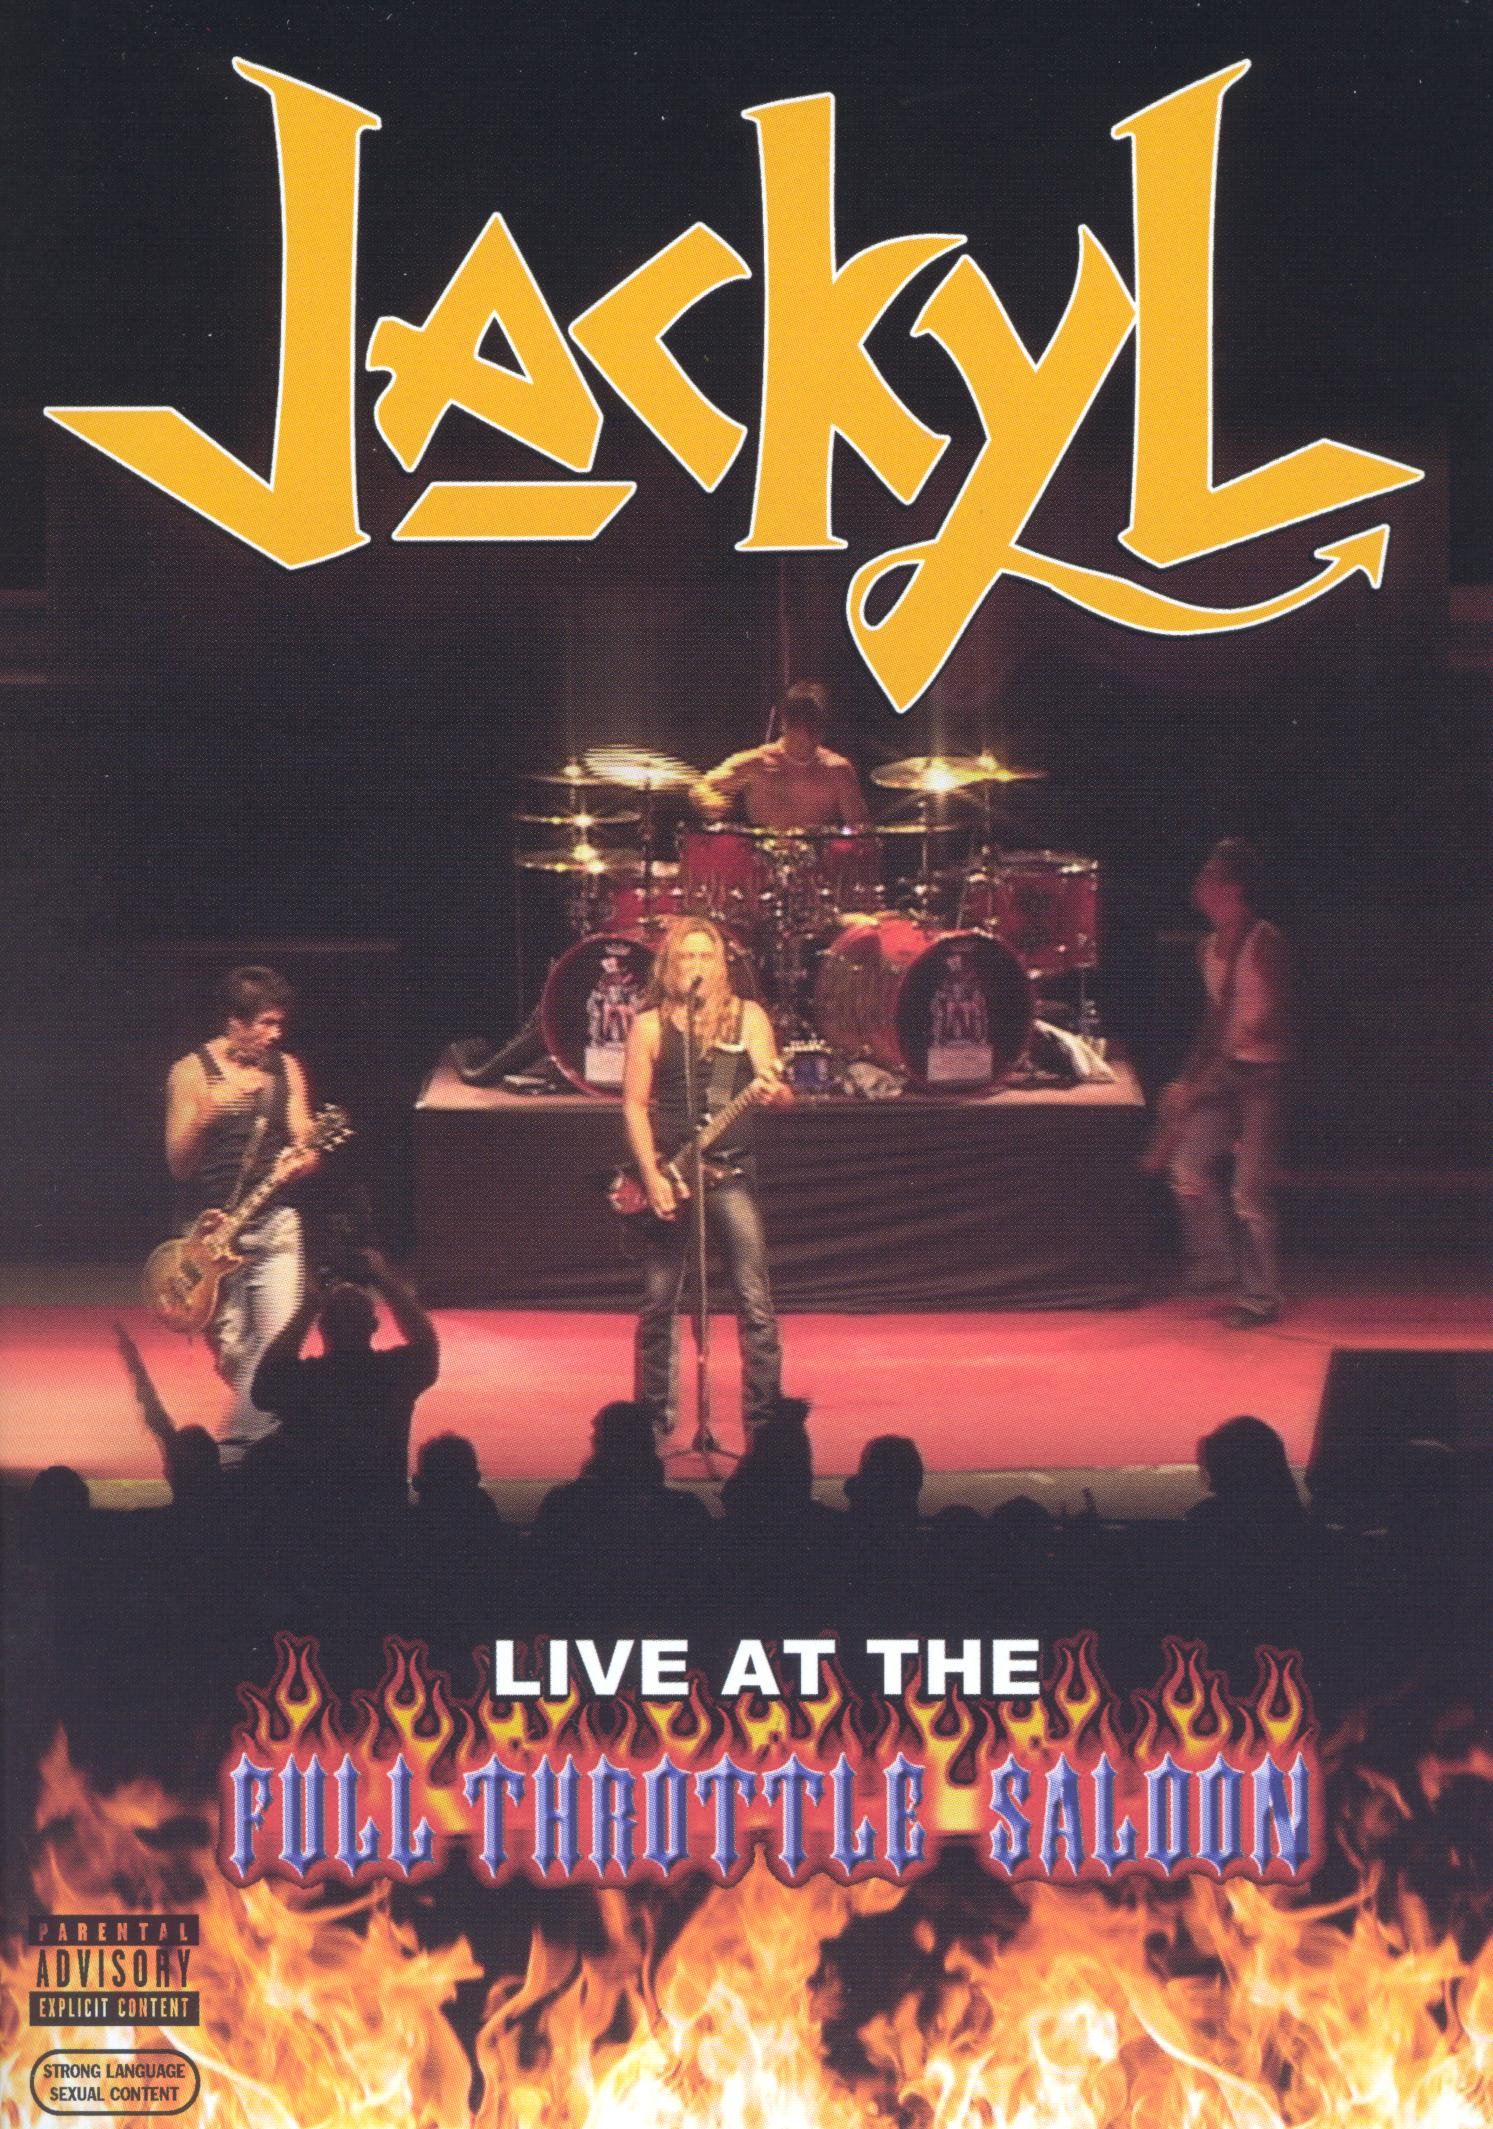 Jackyl: Live at the Full Throttle Saloon